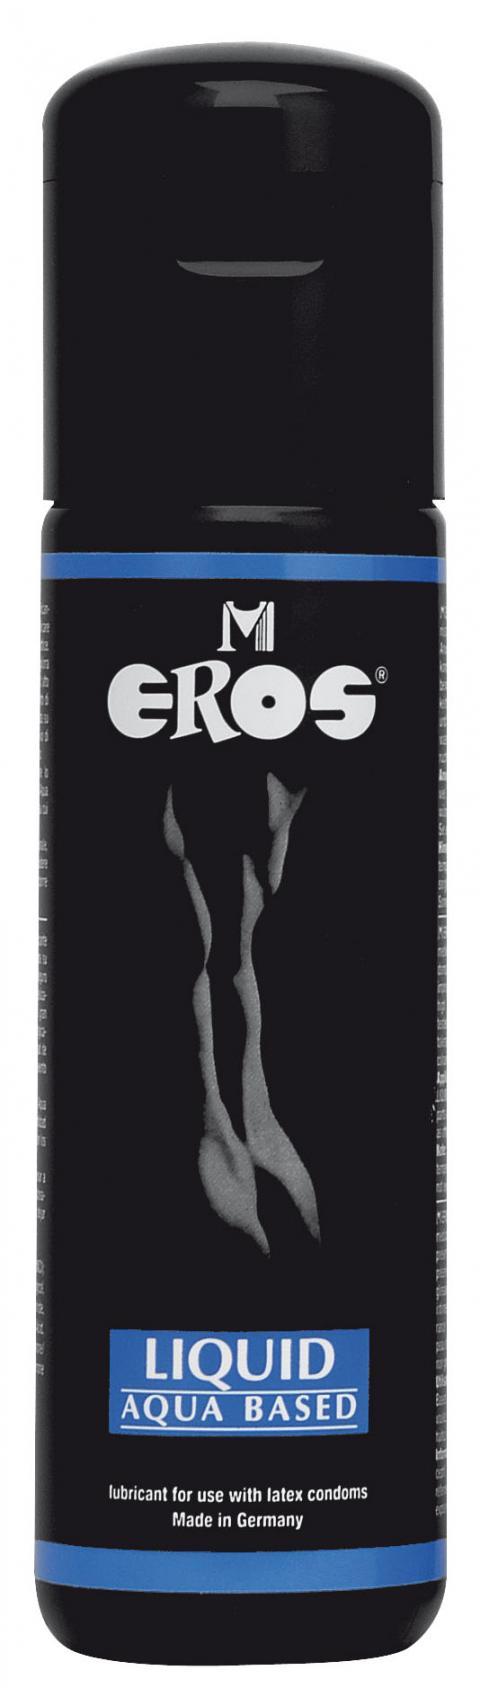 Lubrifiant Eros Liquid 100 ml